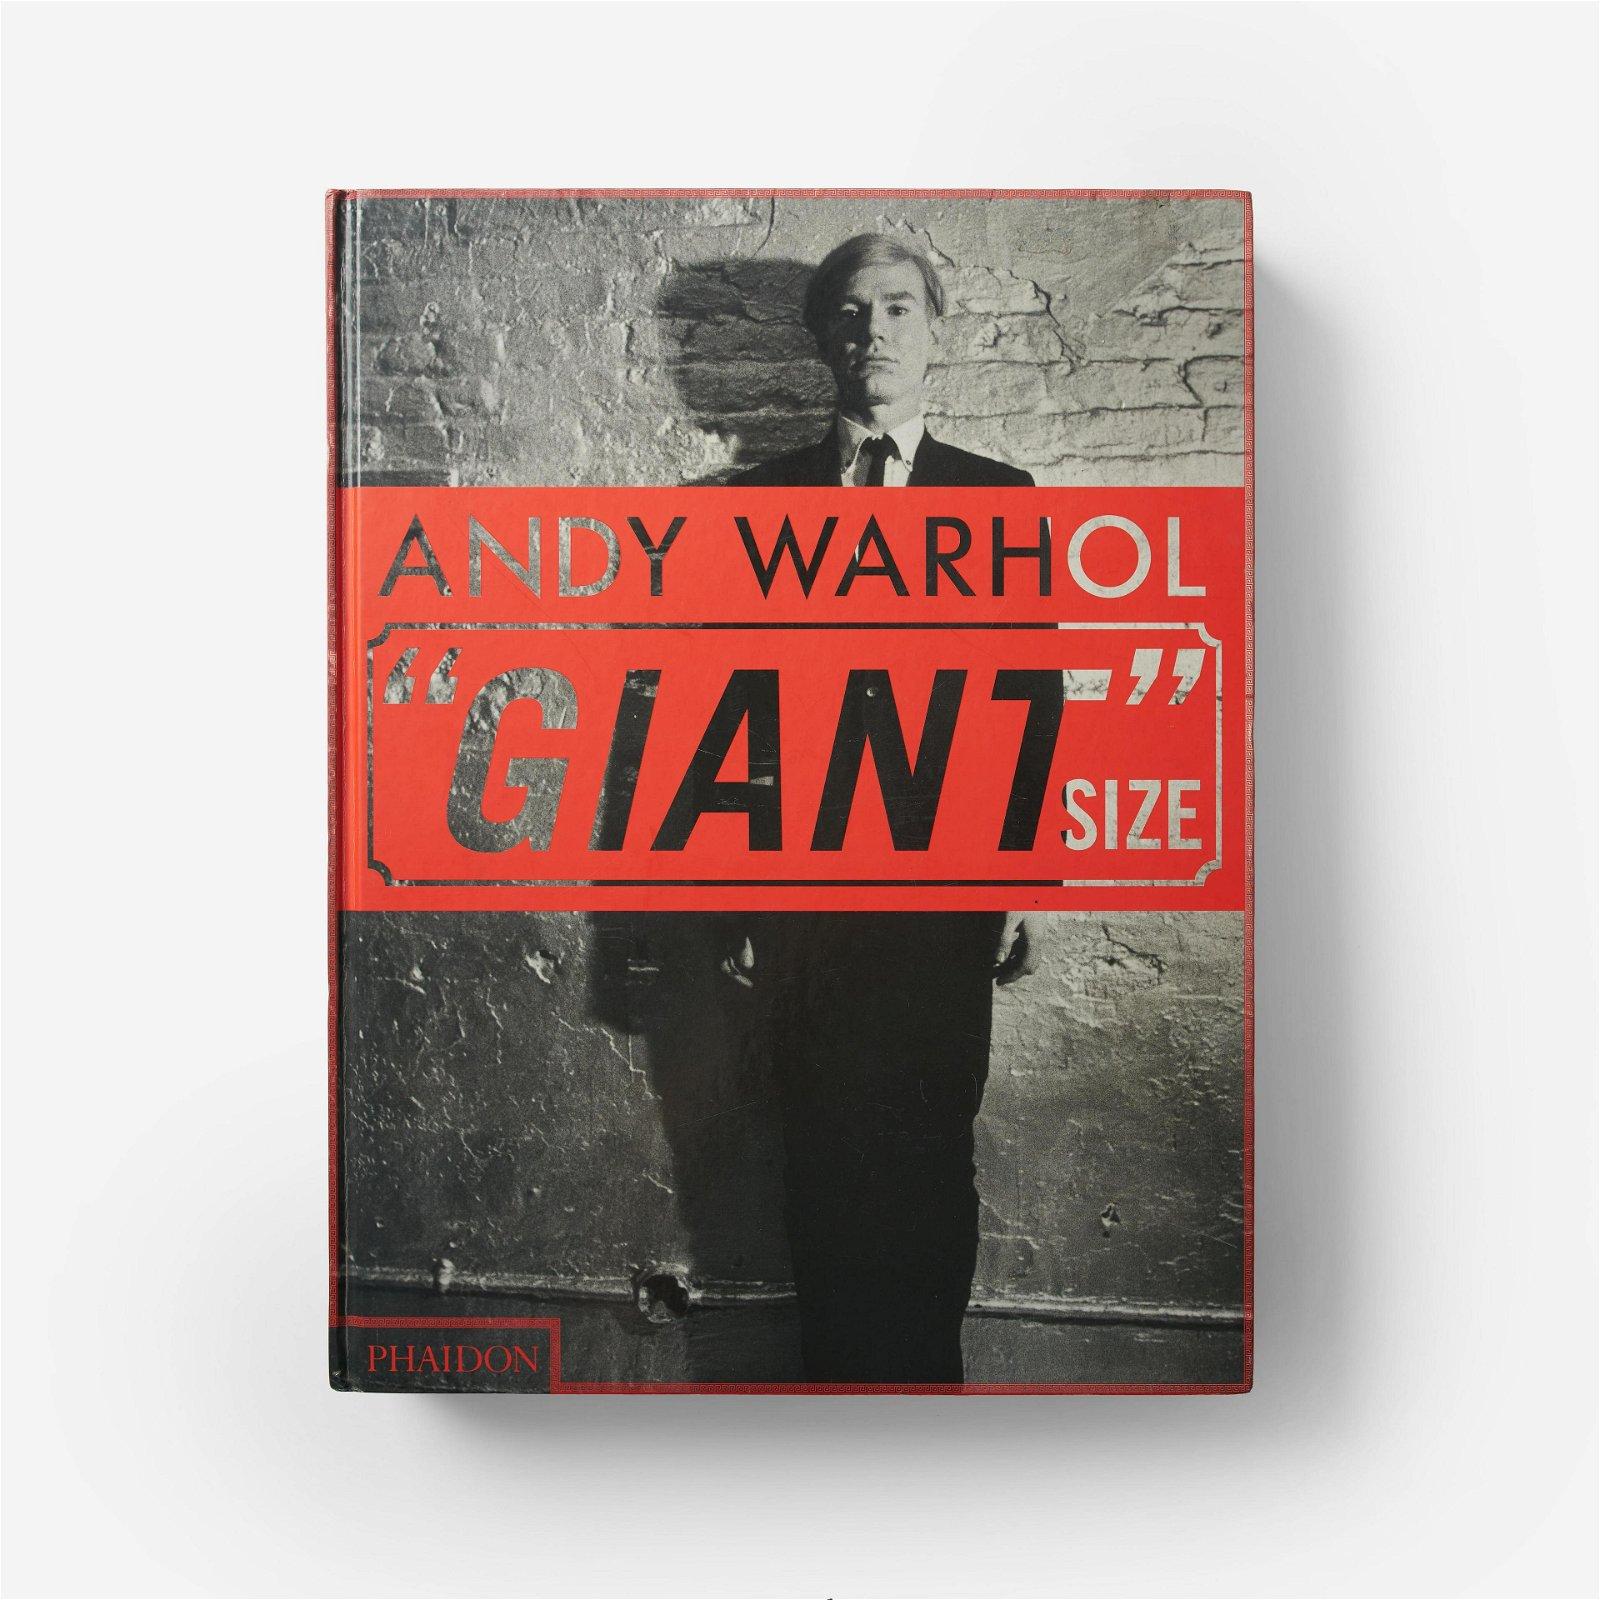 Phaidon Editors - Andy Warhol 'Giant' Size Phaidon Book